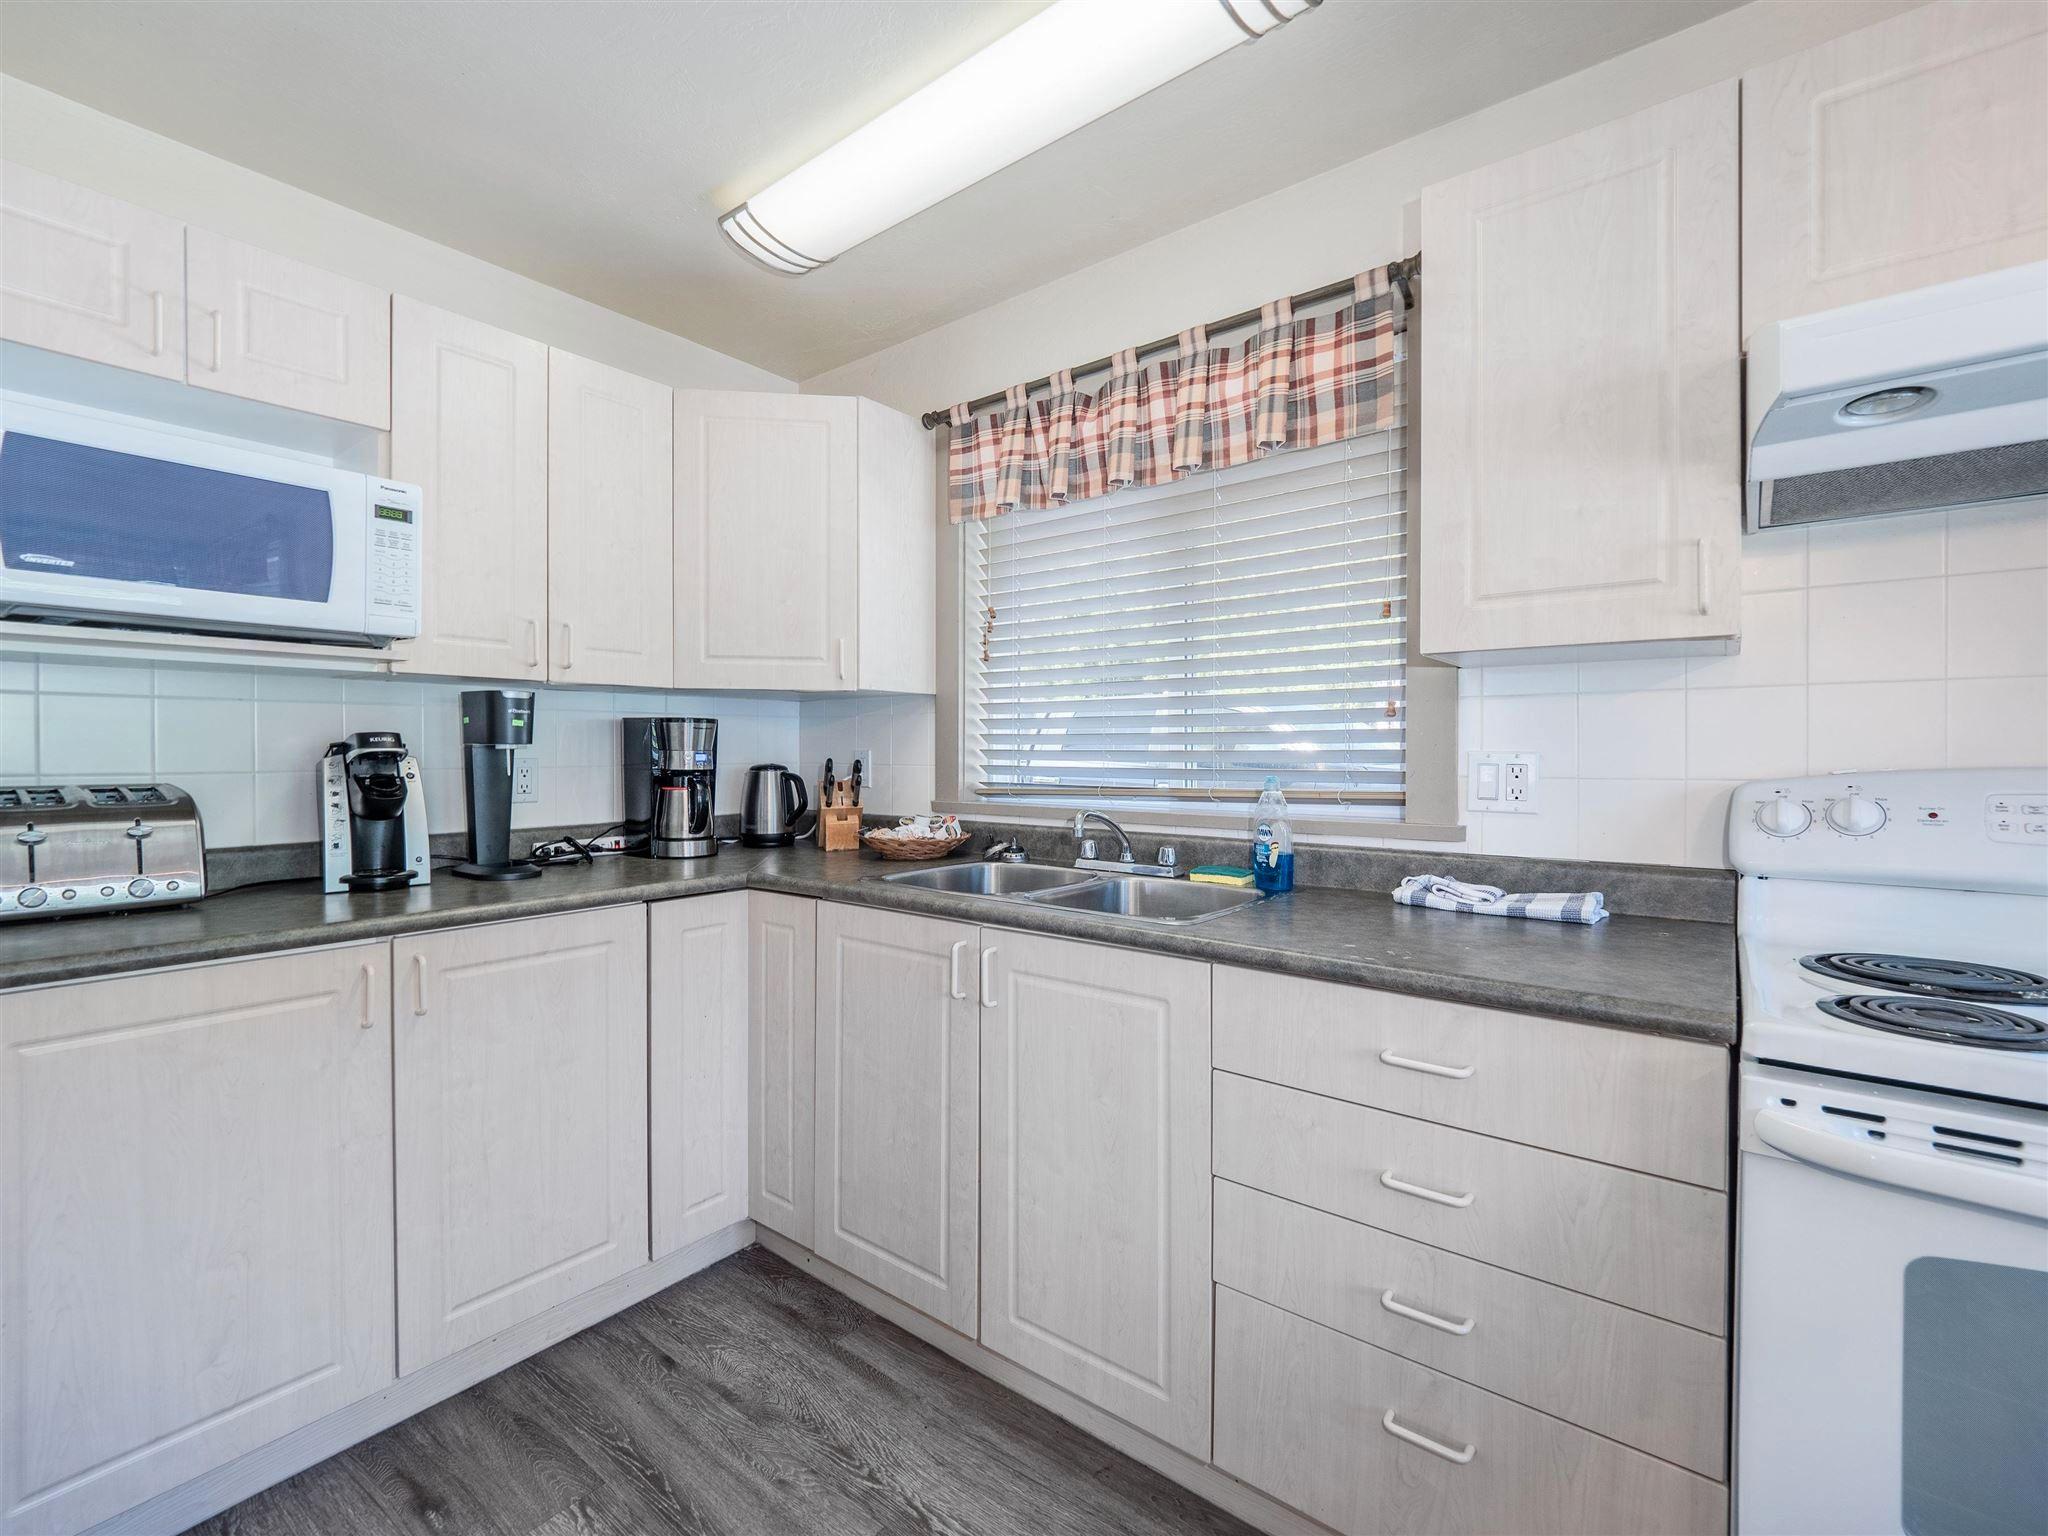 Photo 23: Photos: 6781 BATHGATE Road in Egmont: Pender Harbour Egmont House for sale (Sunshine Coast)  : MLS®# R2593981